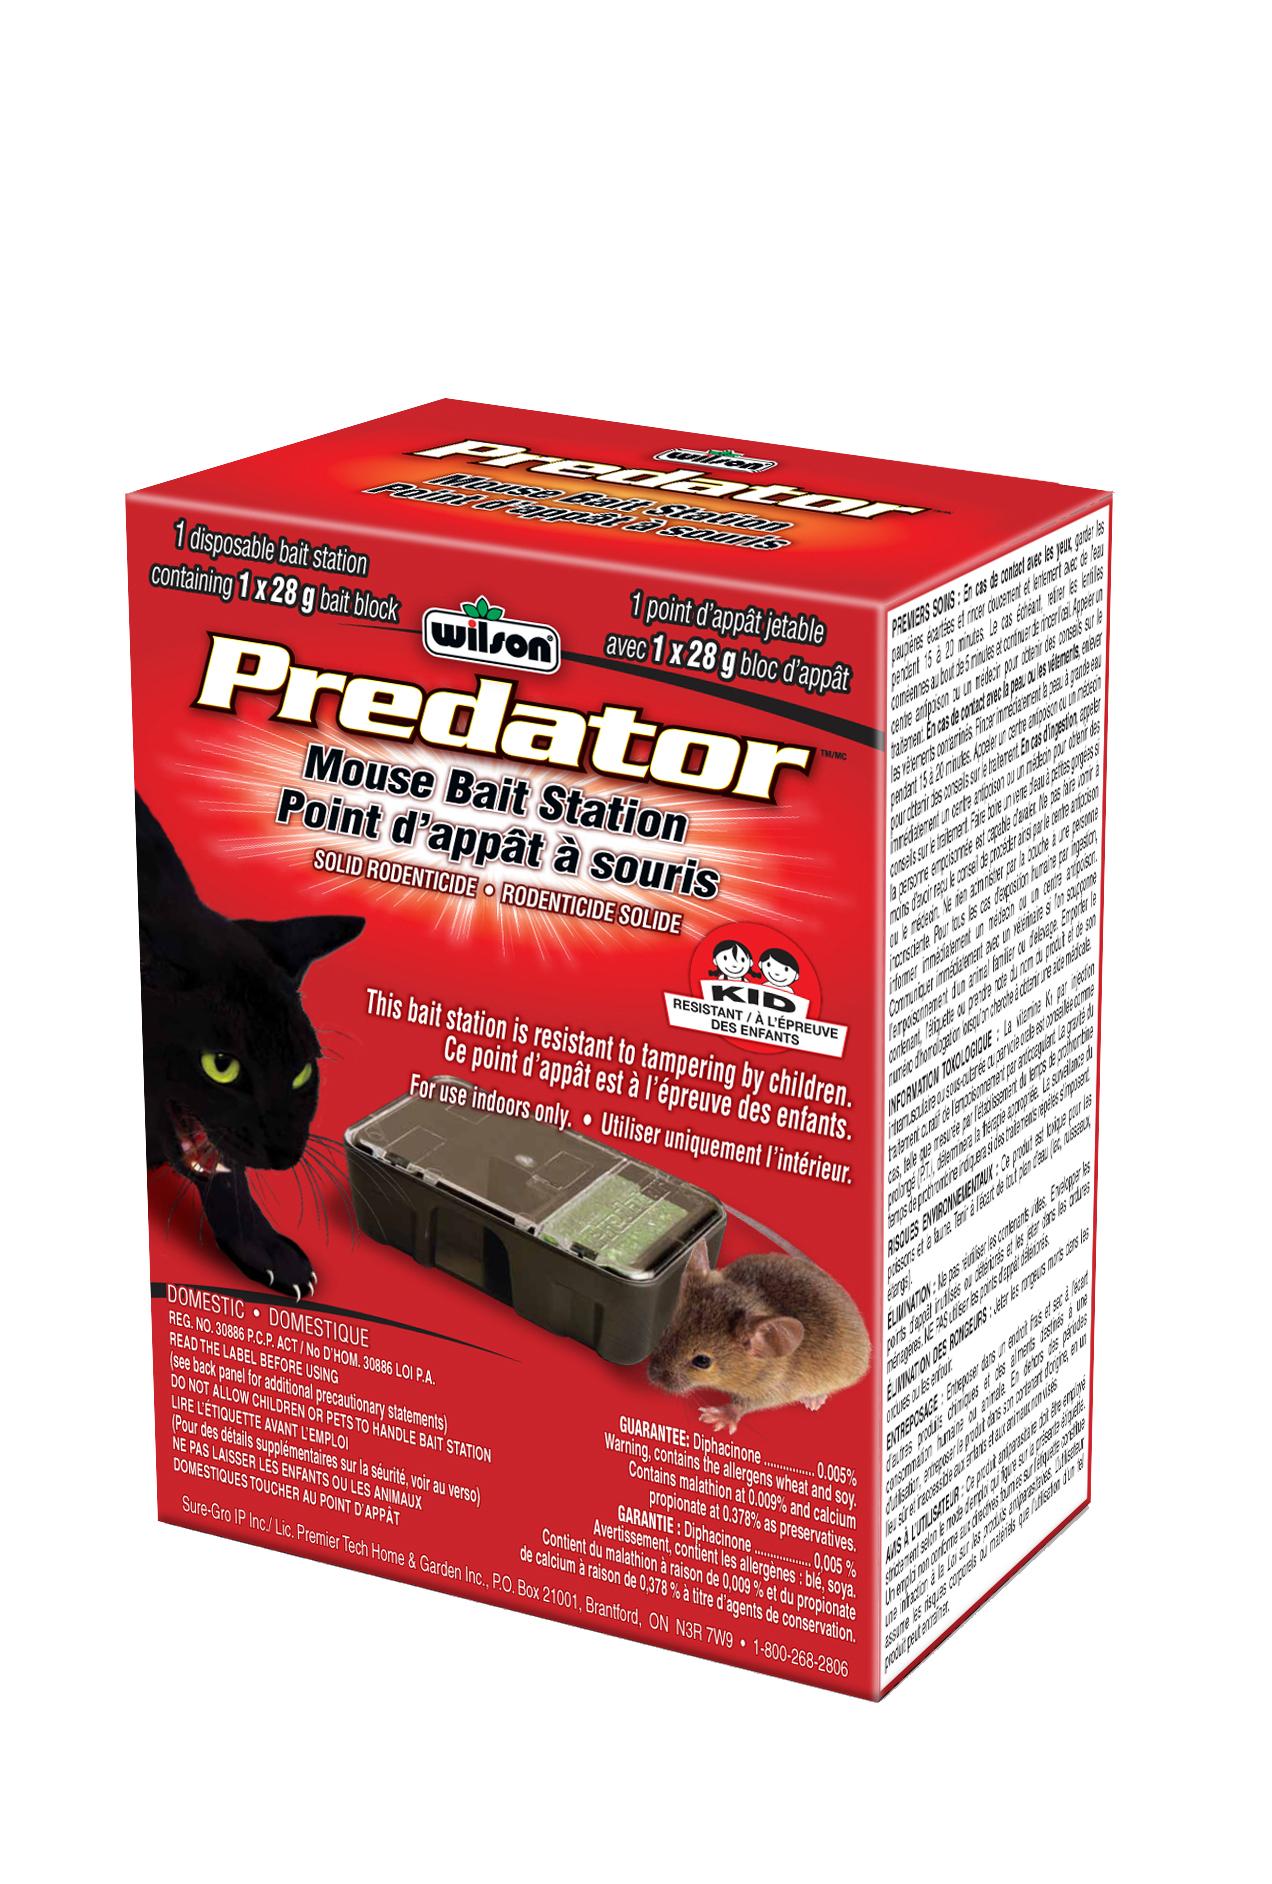 7740060 Wilson Predator Mouse Bait Station 1pkHiRes_EF_RGBweb